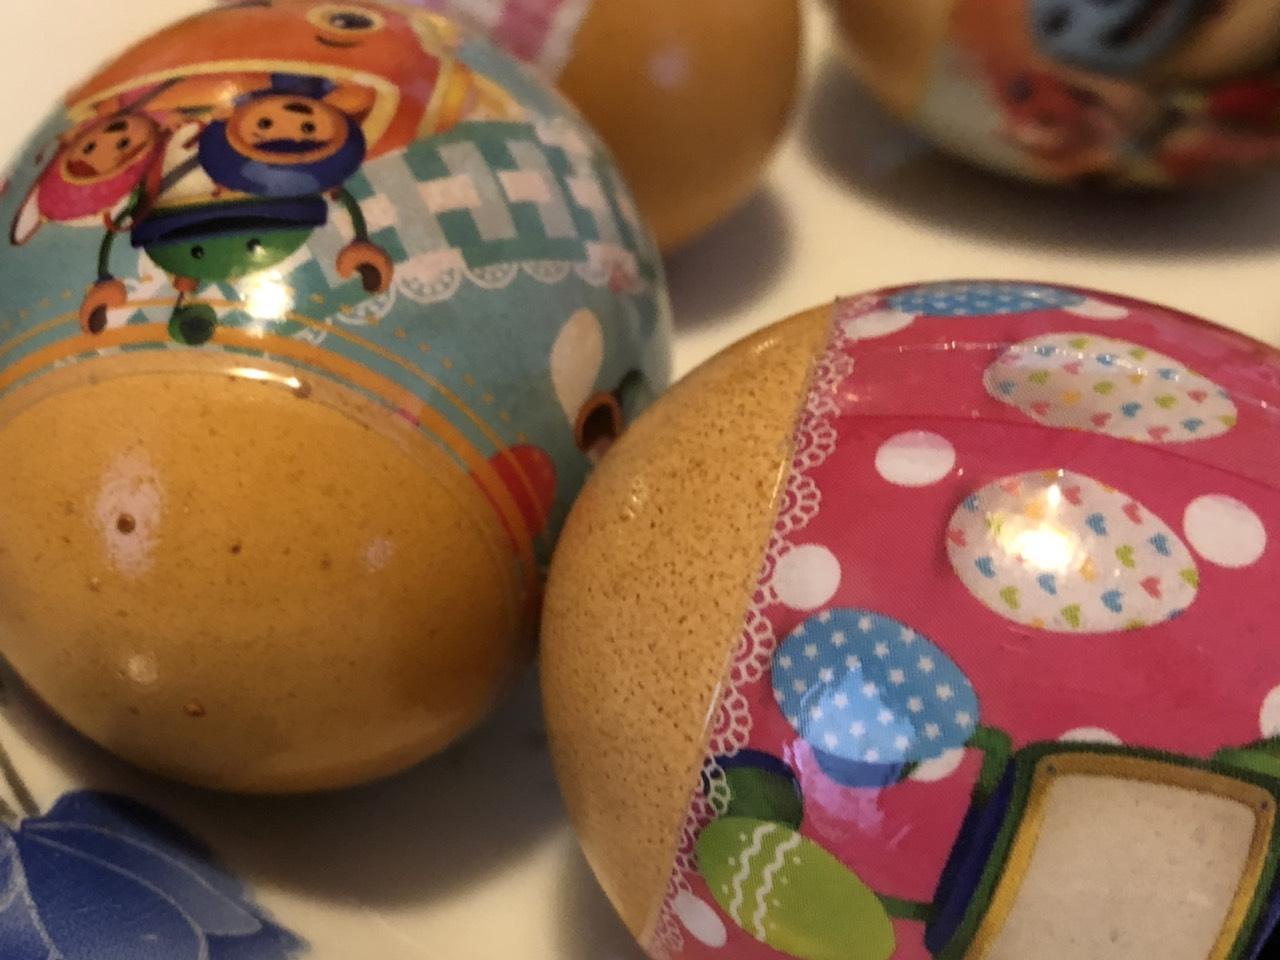 Vaskršnja jaja, foto: M. Miladinović